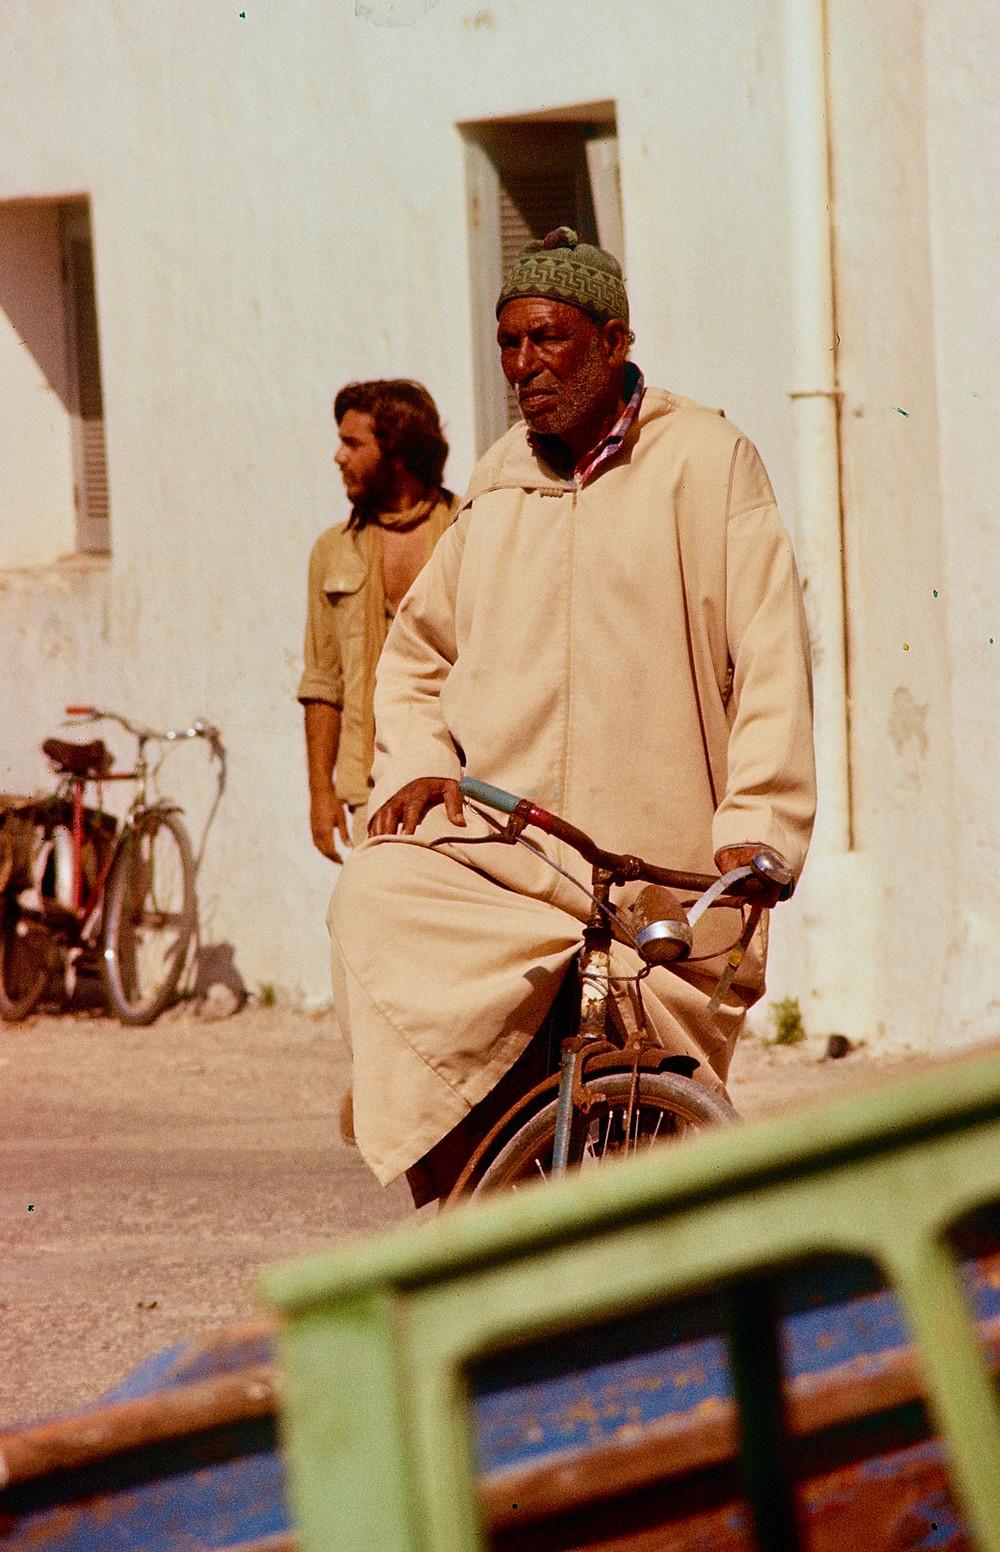 Moroccan cyclist 1978